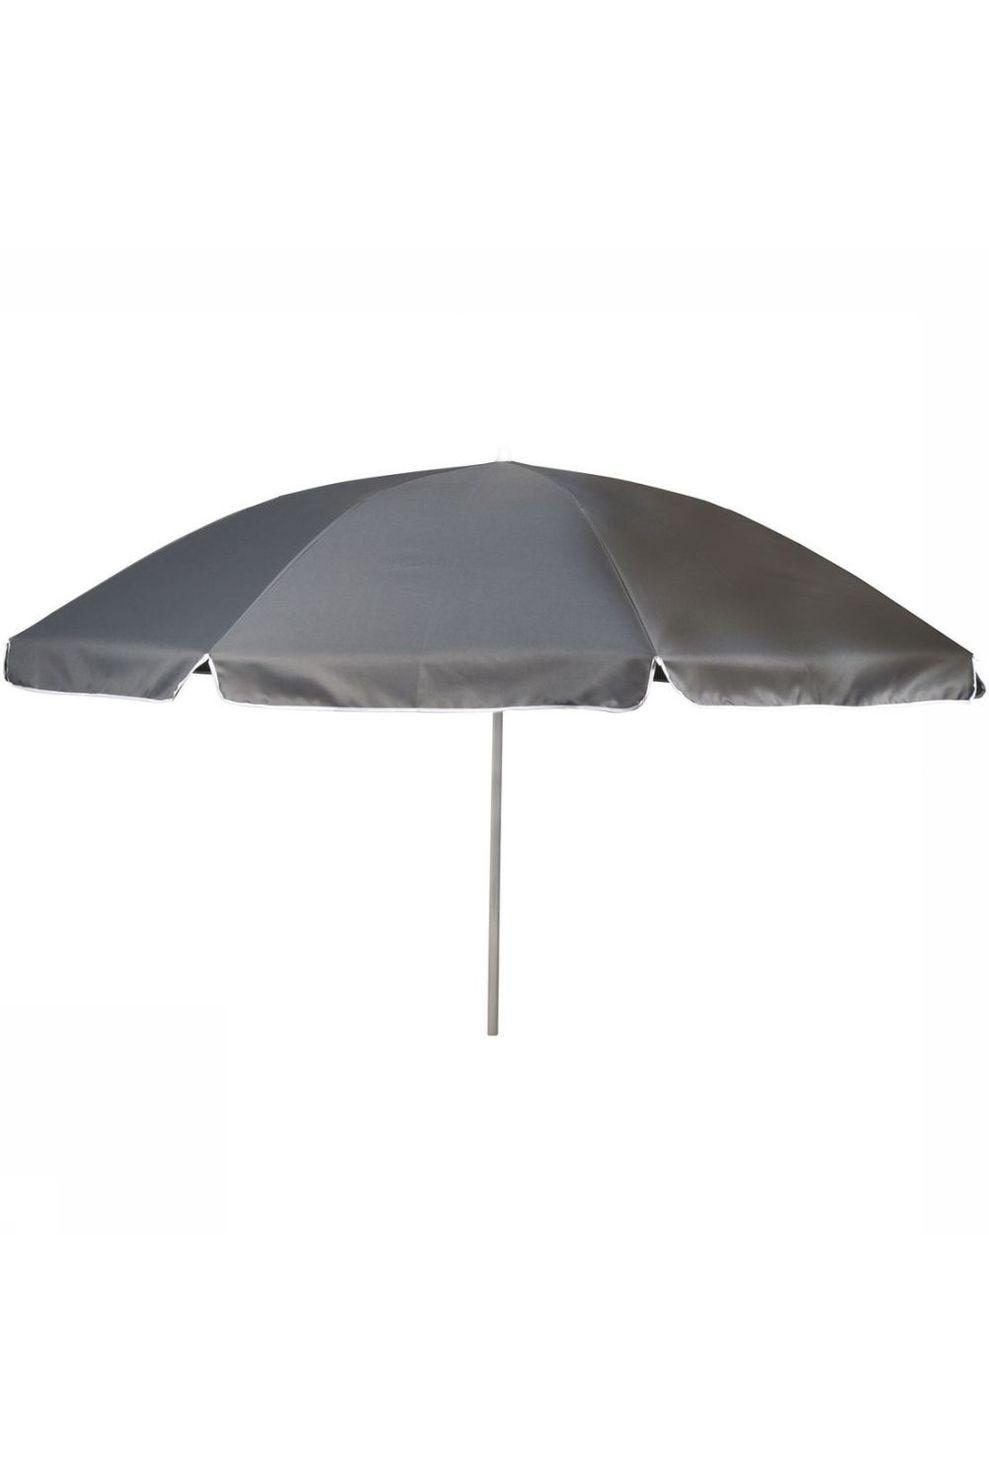 Van Assendelft Diverse Parasol Ø 200 Cm - Grijs